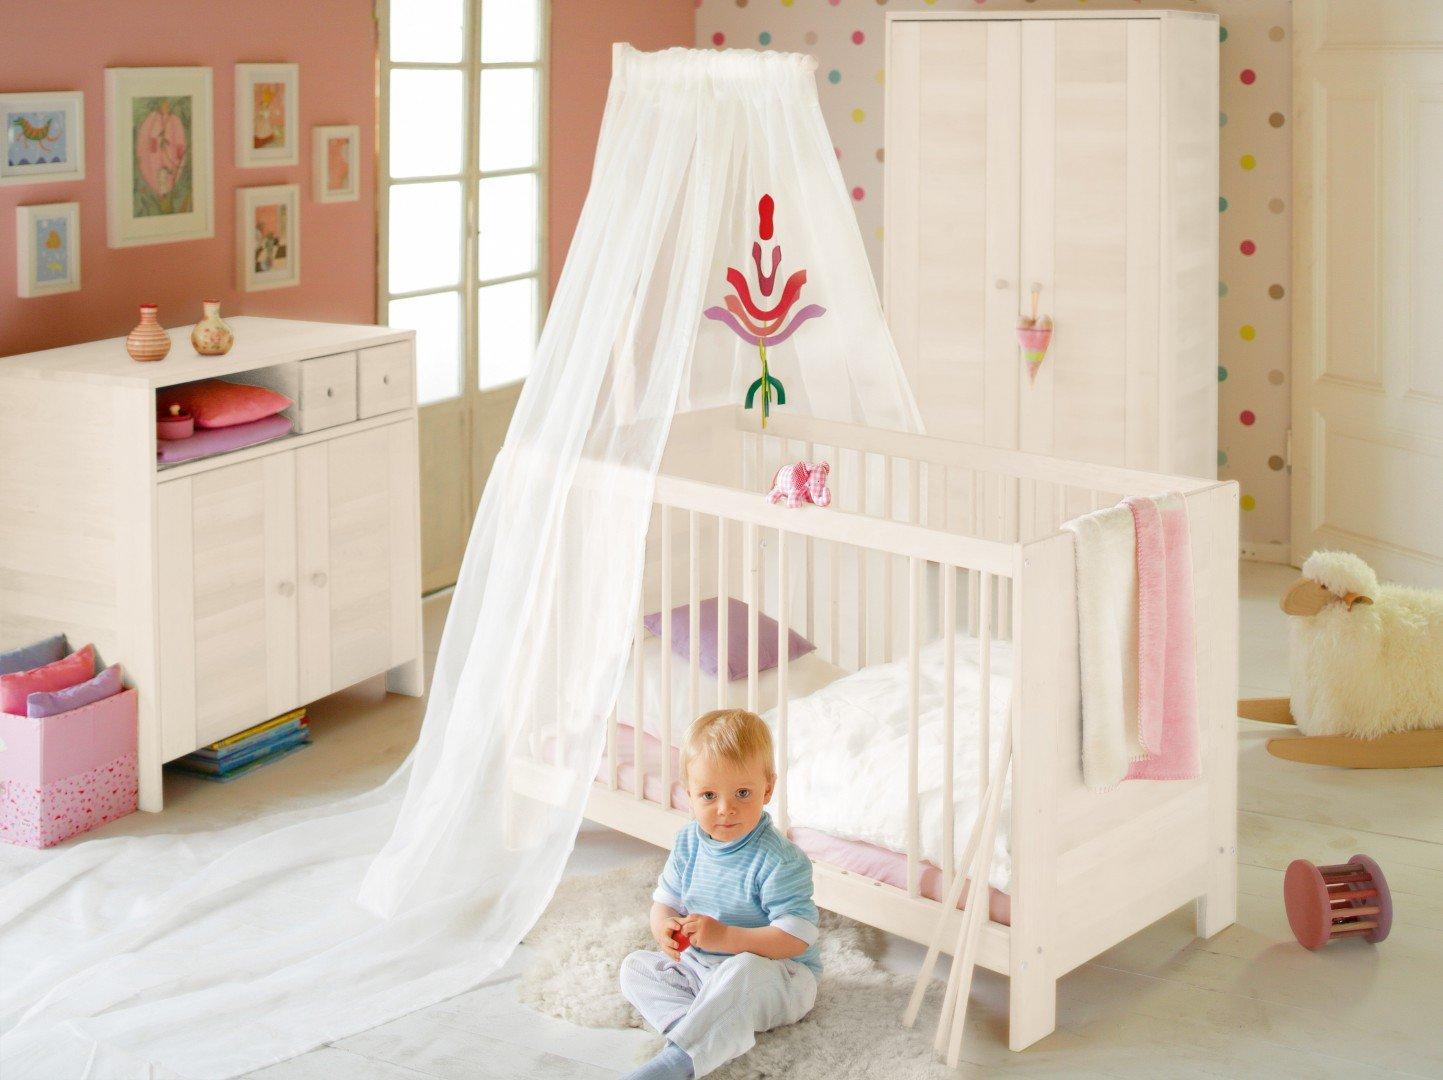 BioKinder 23906 Niklas Spar-Set Babyzimmer aus Massivholz Kiefer weiß